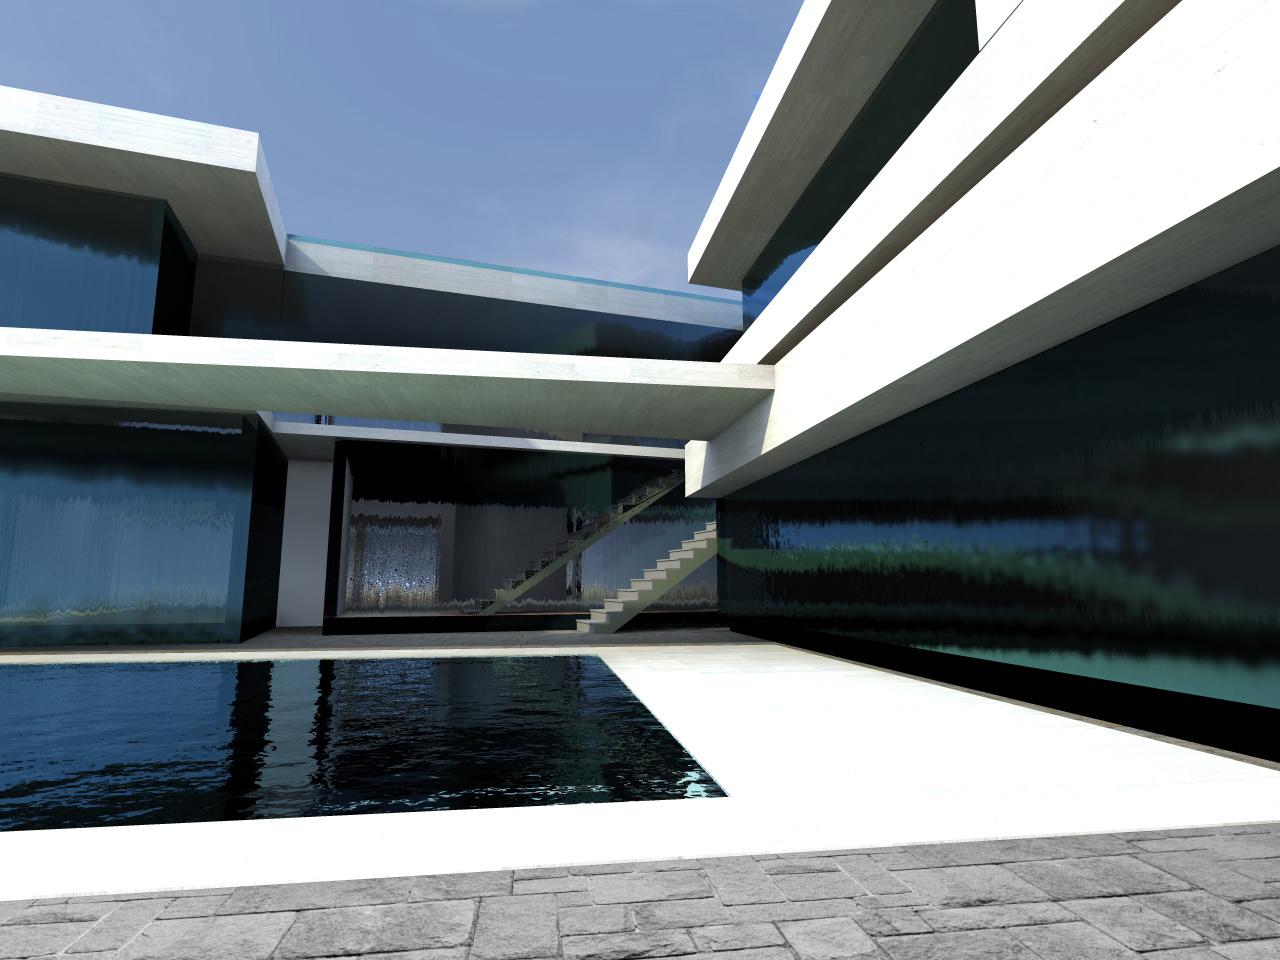 Architettura And Design luxury house in qatar | claudio catalano architettura